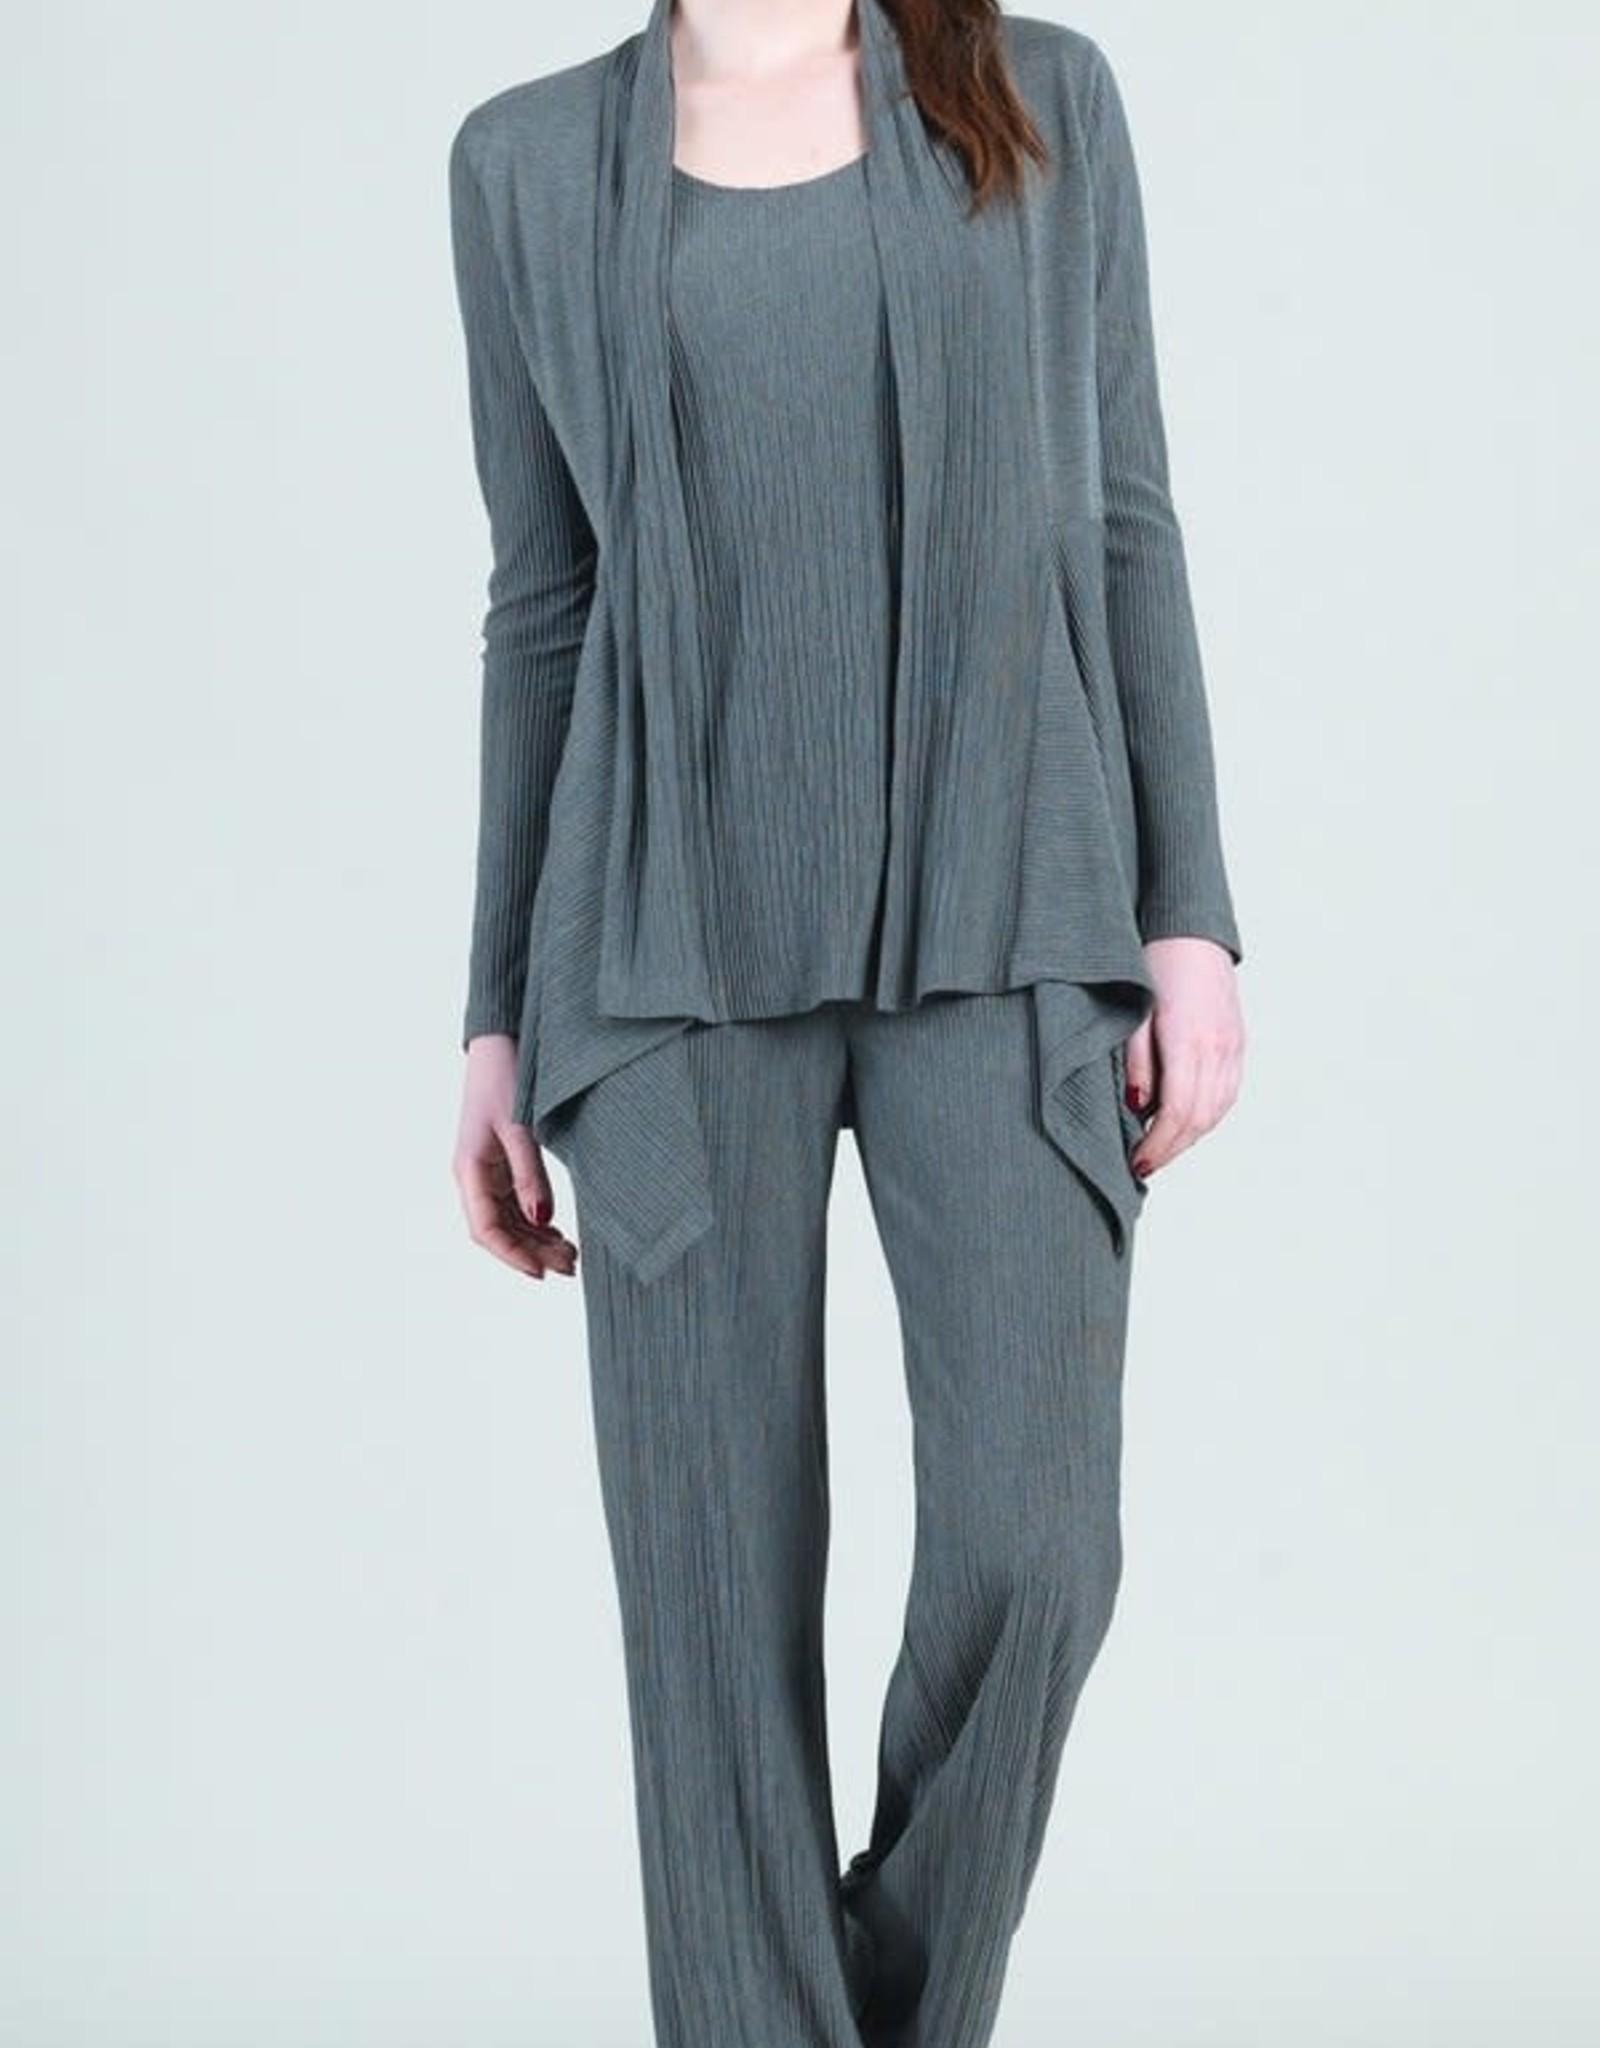 Clara Sunwoo Charcoal Pleated Soft Knit Cardigan/Tank Set